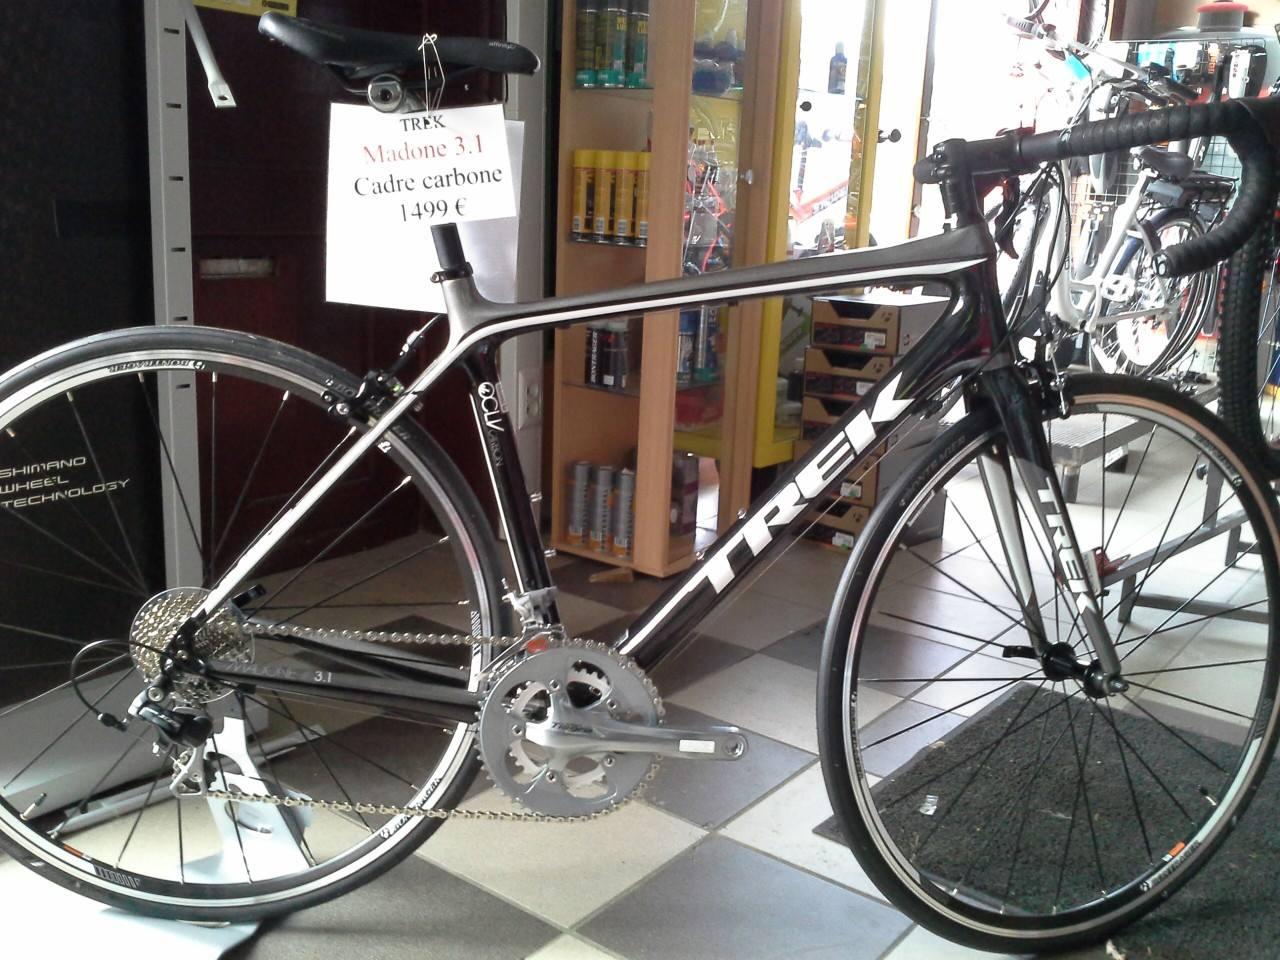 Cycles Radoux | trek madone 3.1 2014.jpg